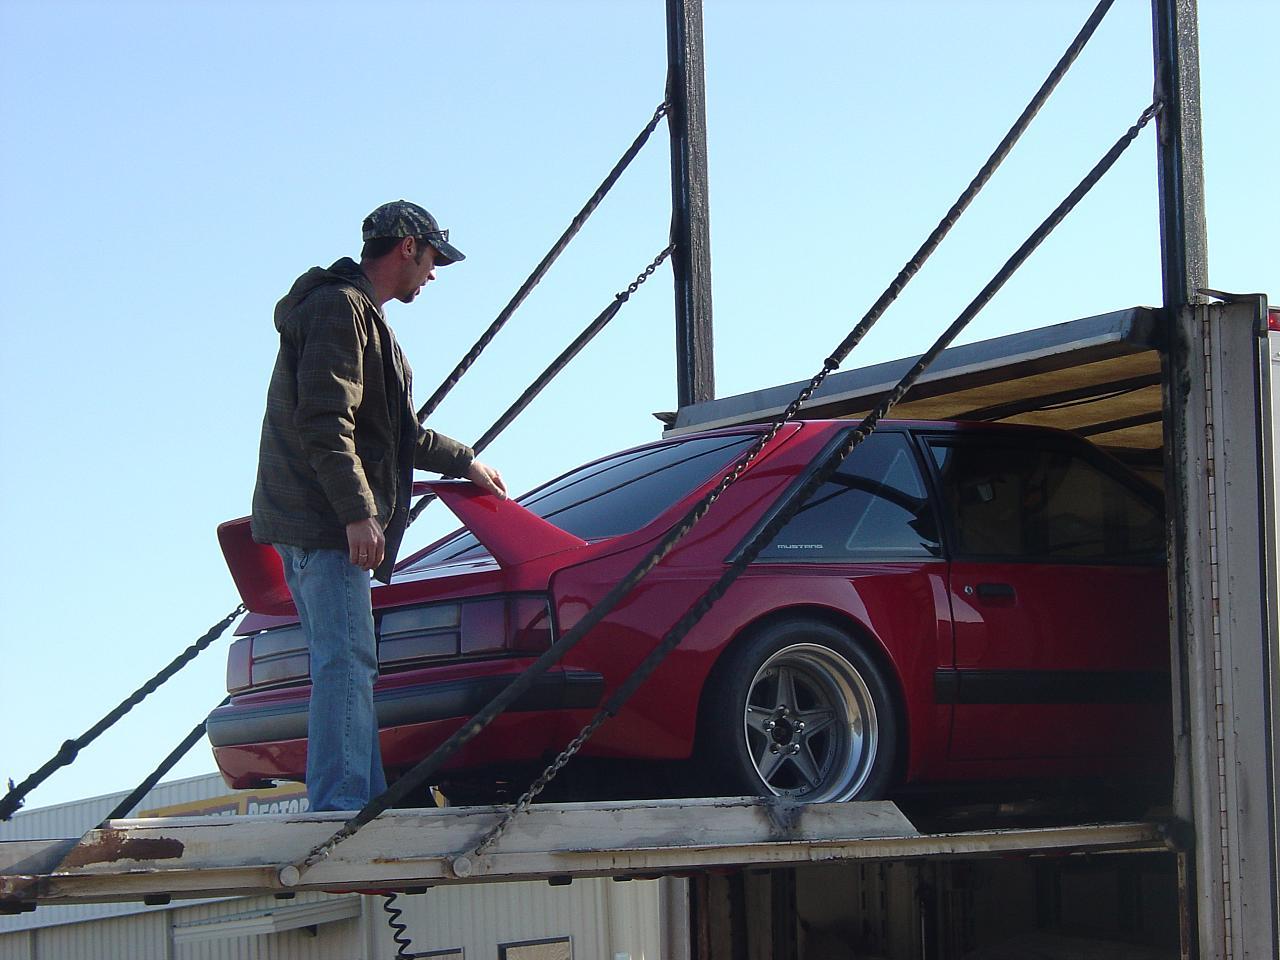 Unloading JBA Dominator GTA From Truck